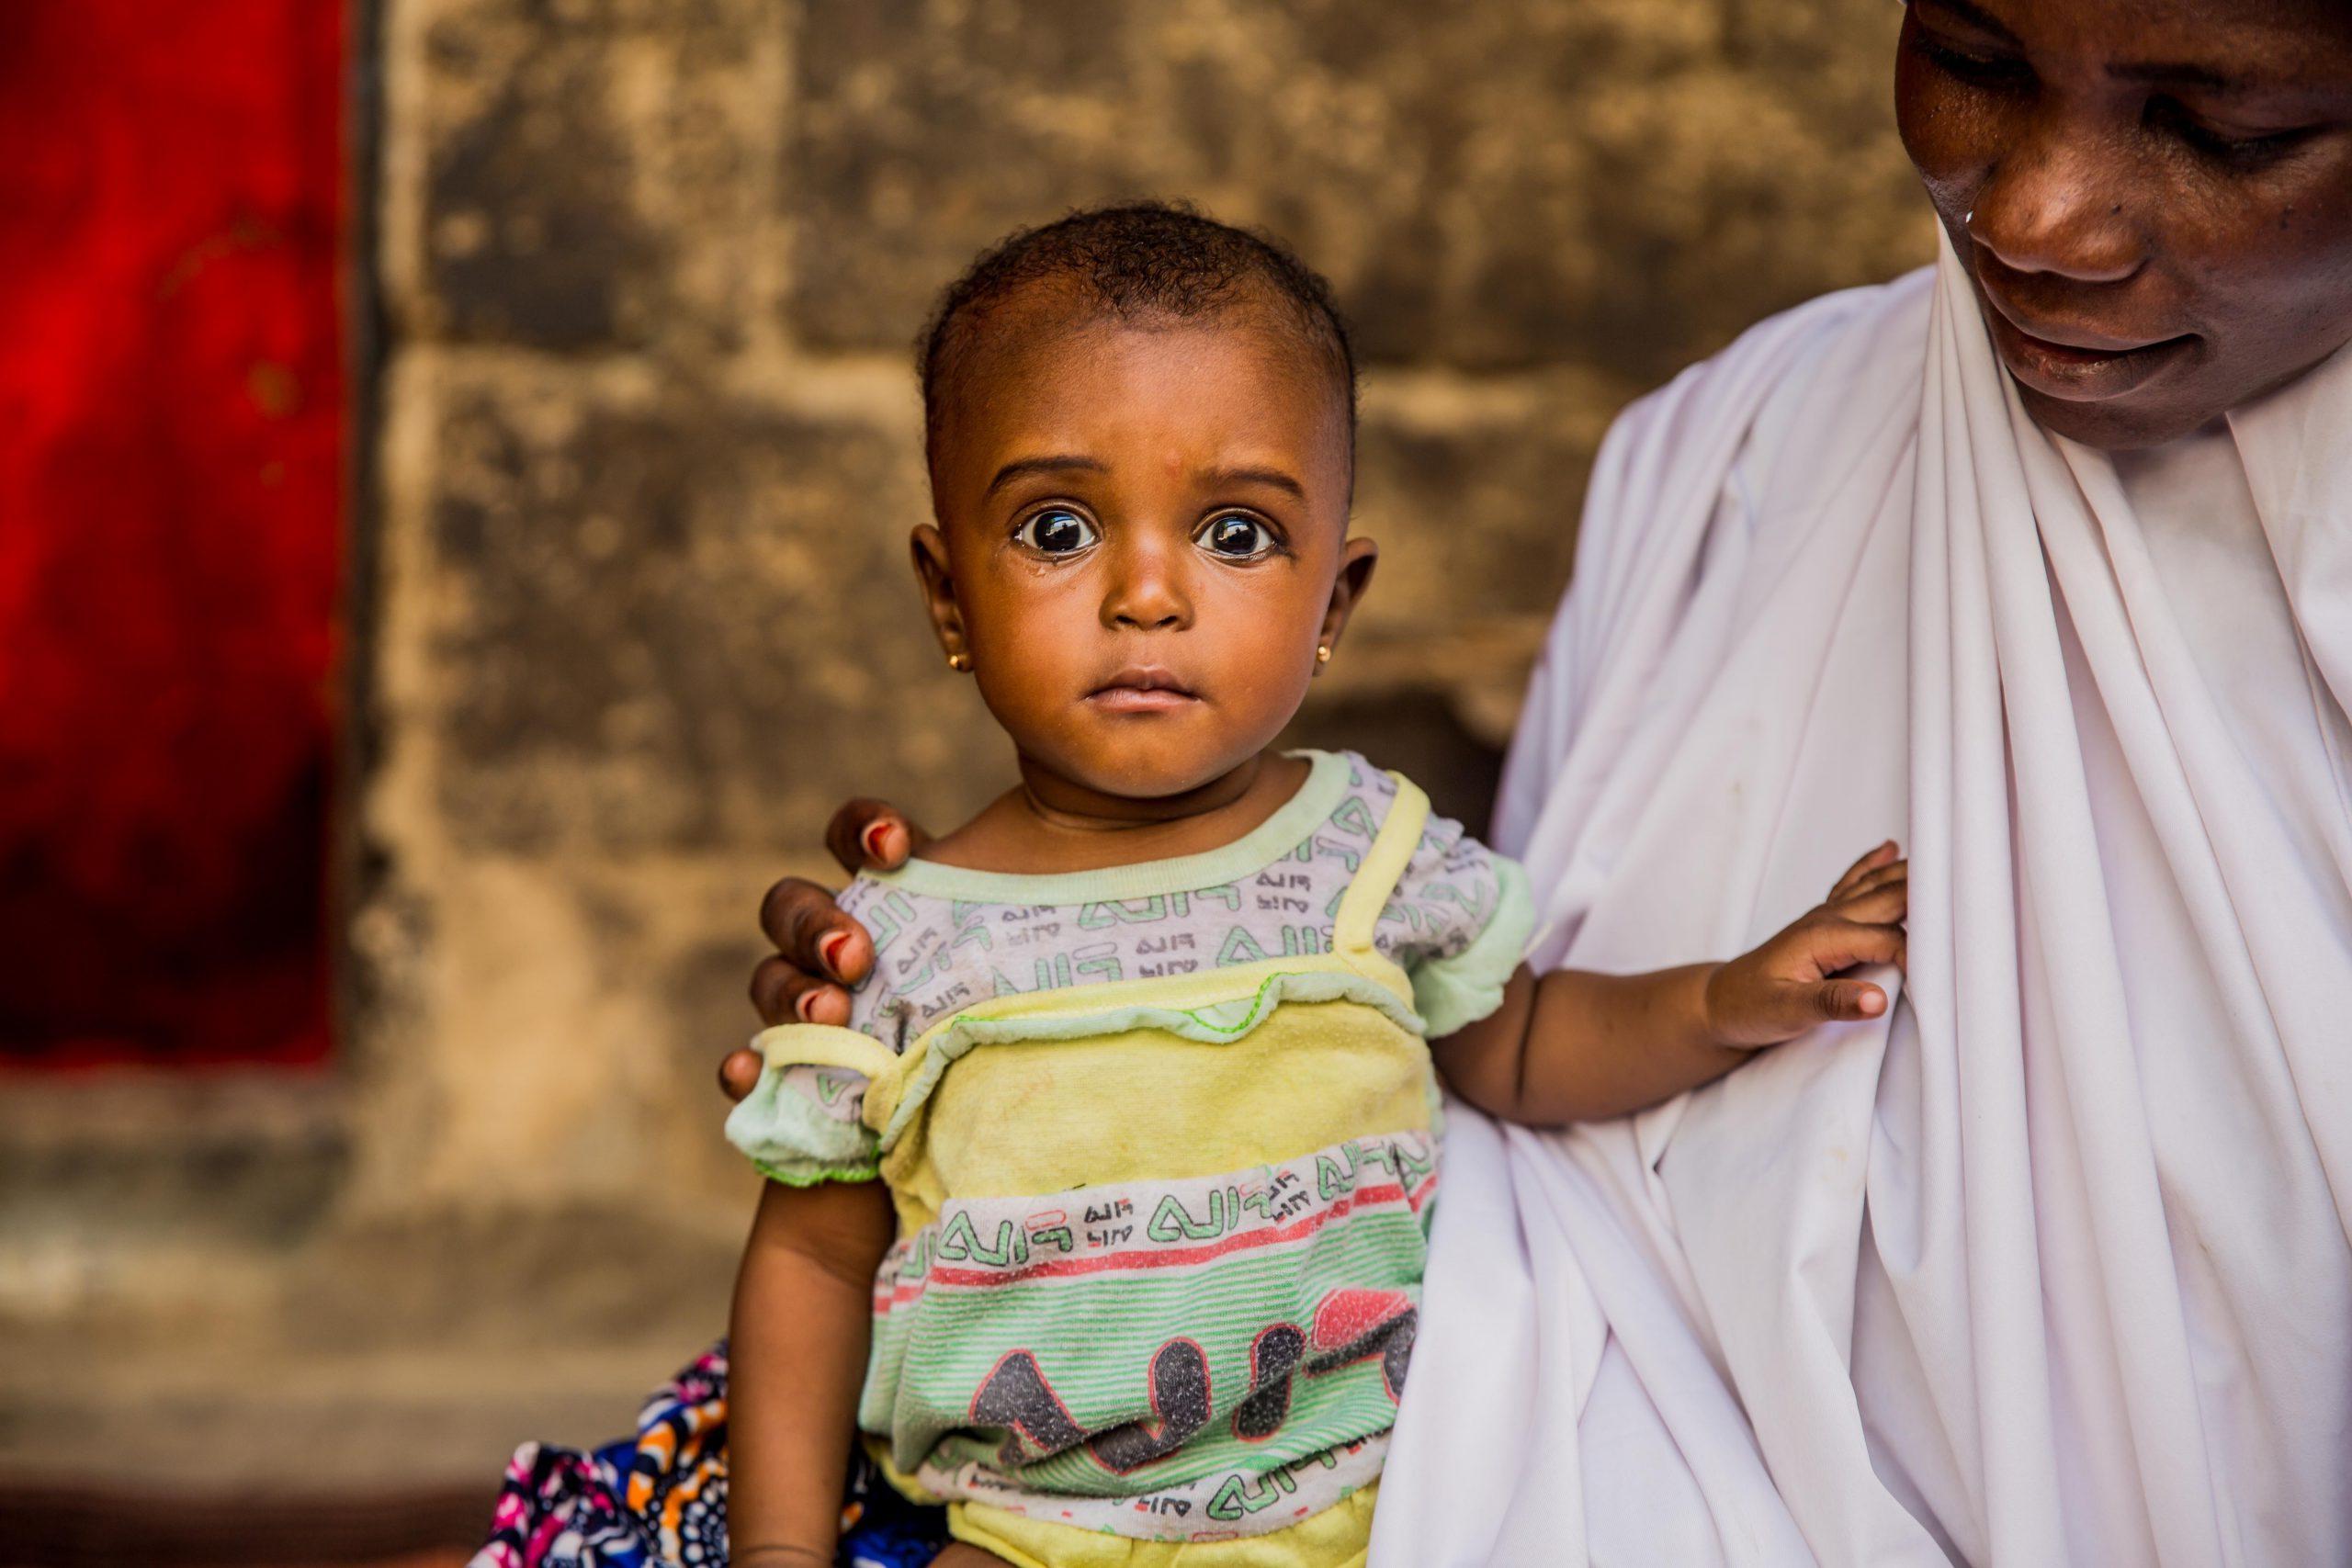 Famine affects children in Nigeria